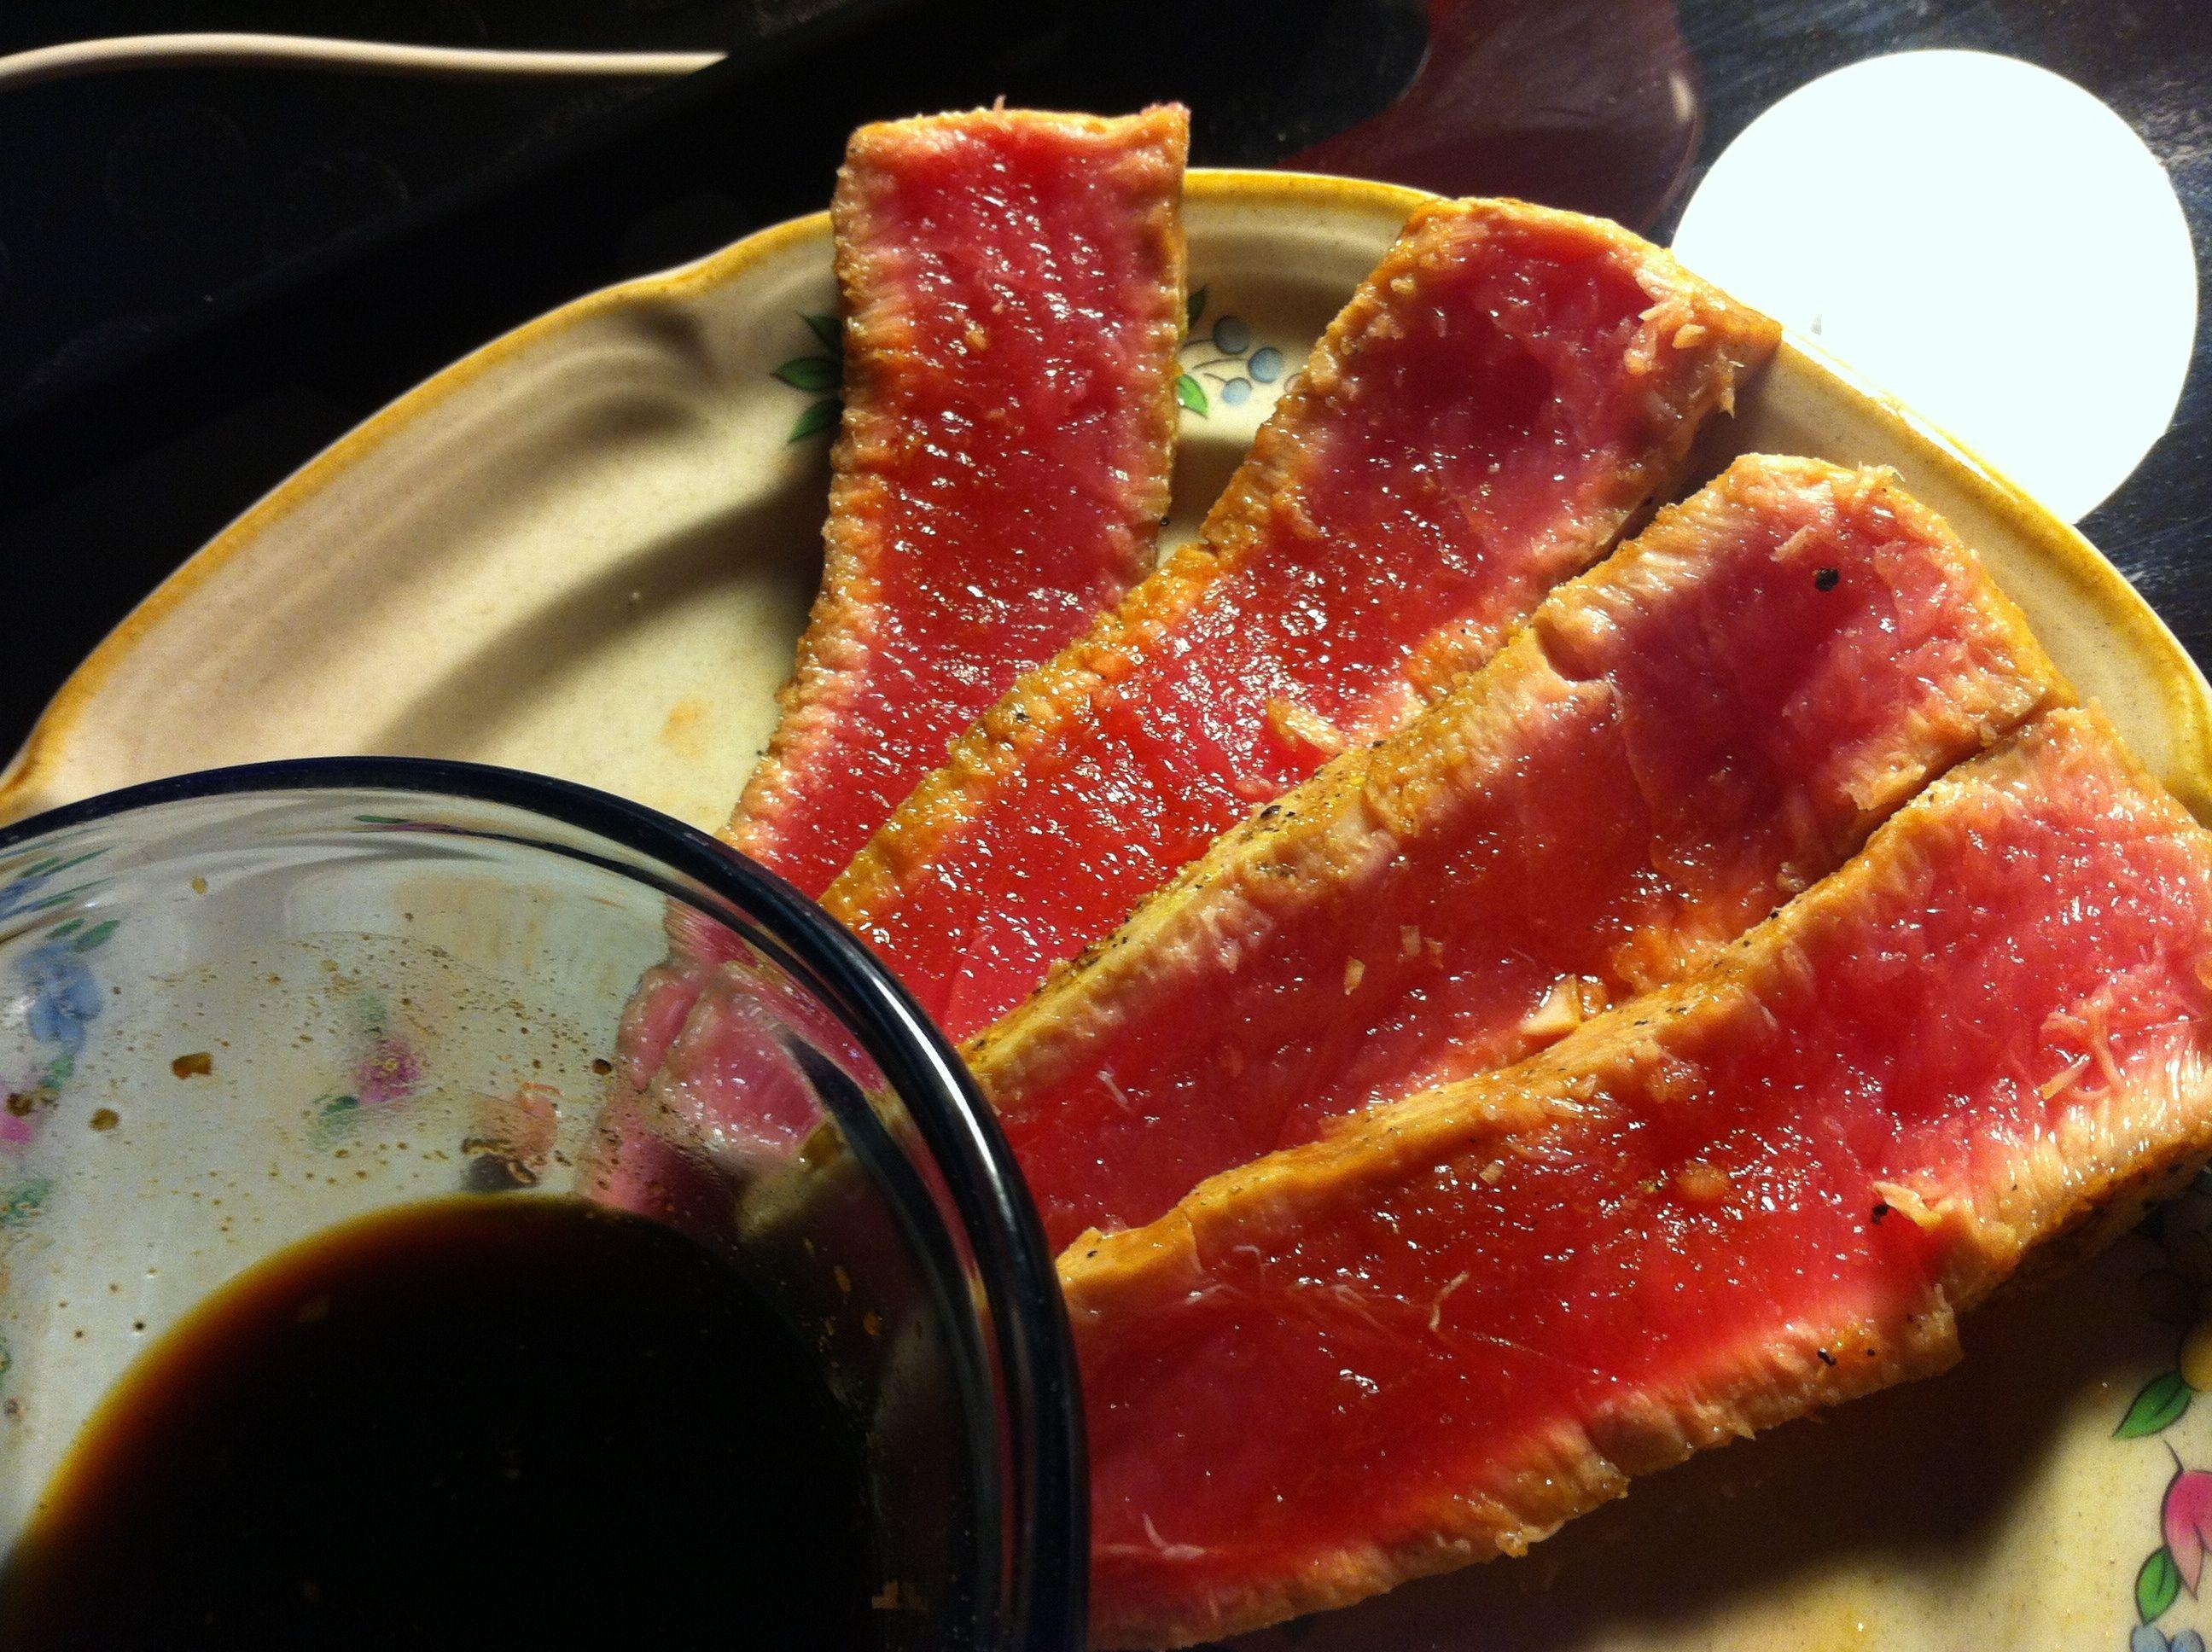 Pan Seared Ahi Tuna Steak with Gluten-Free Tamari based teriyaki sauce, made with agave nectar, fresh ginger, garlic & lime juice